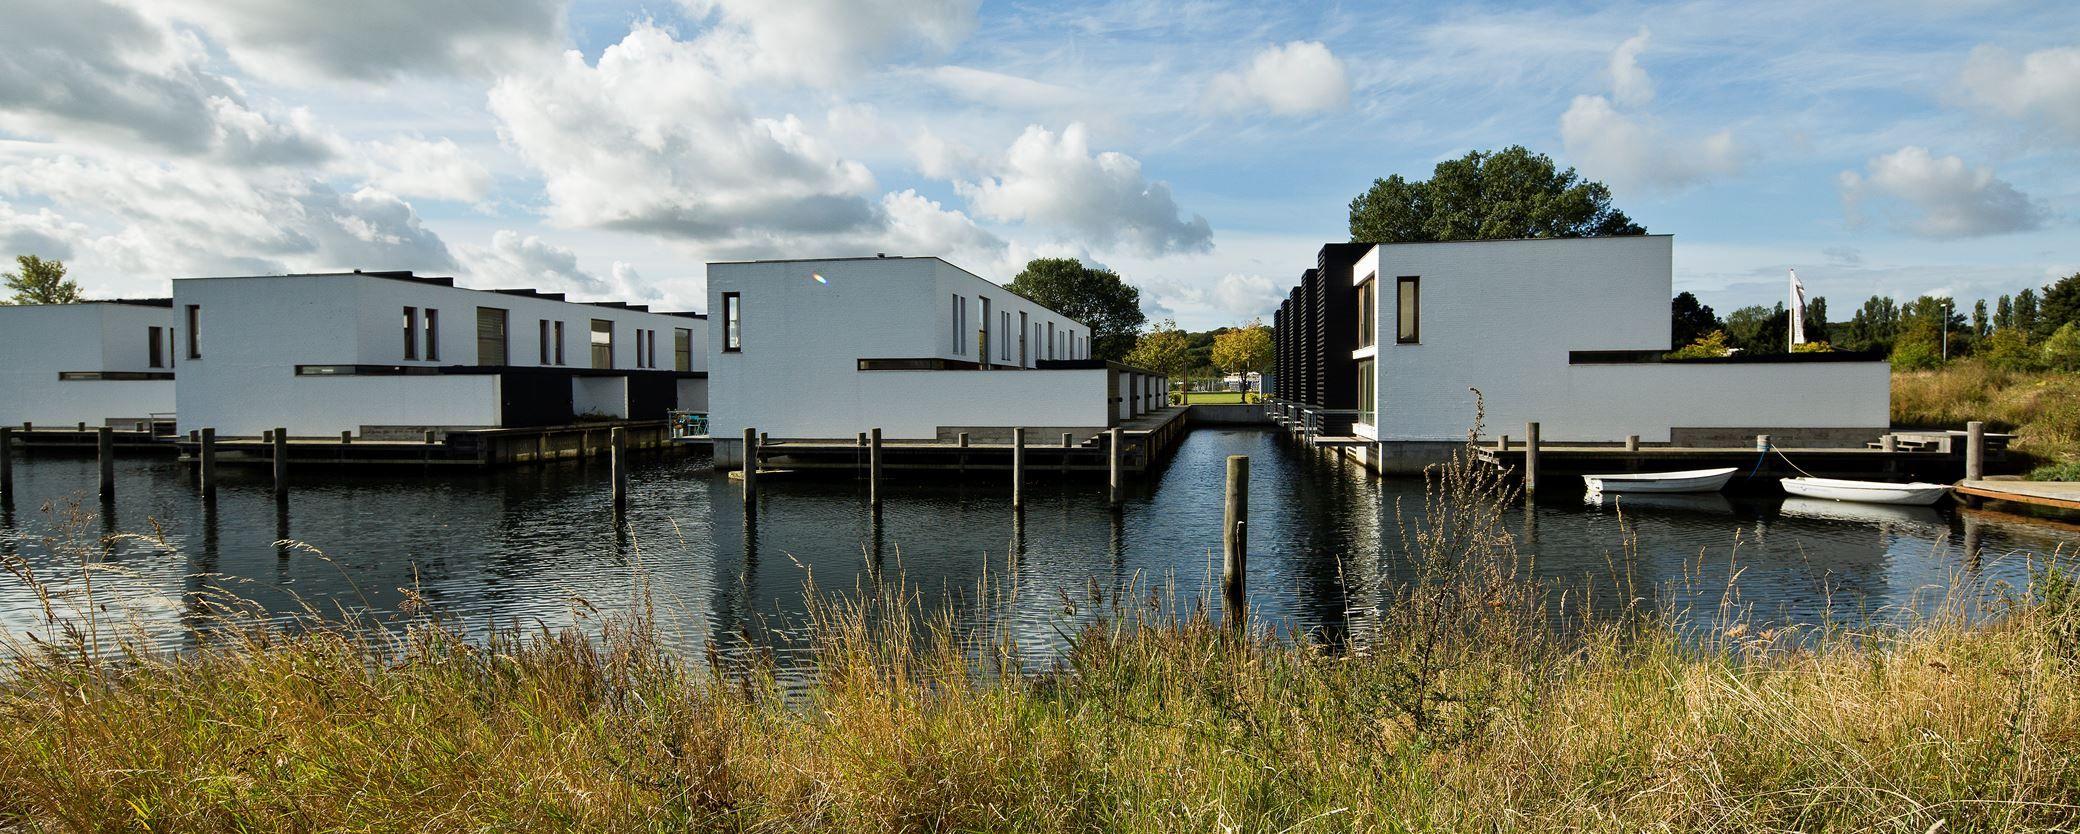 Huse og boliger | Arkitekt | Arkitema Architects